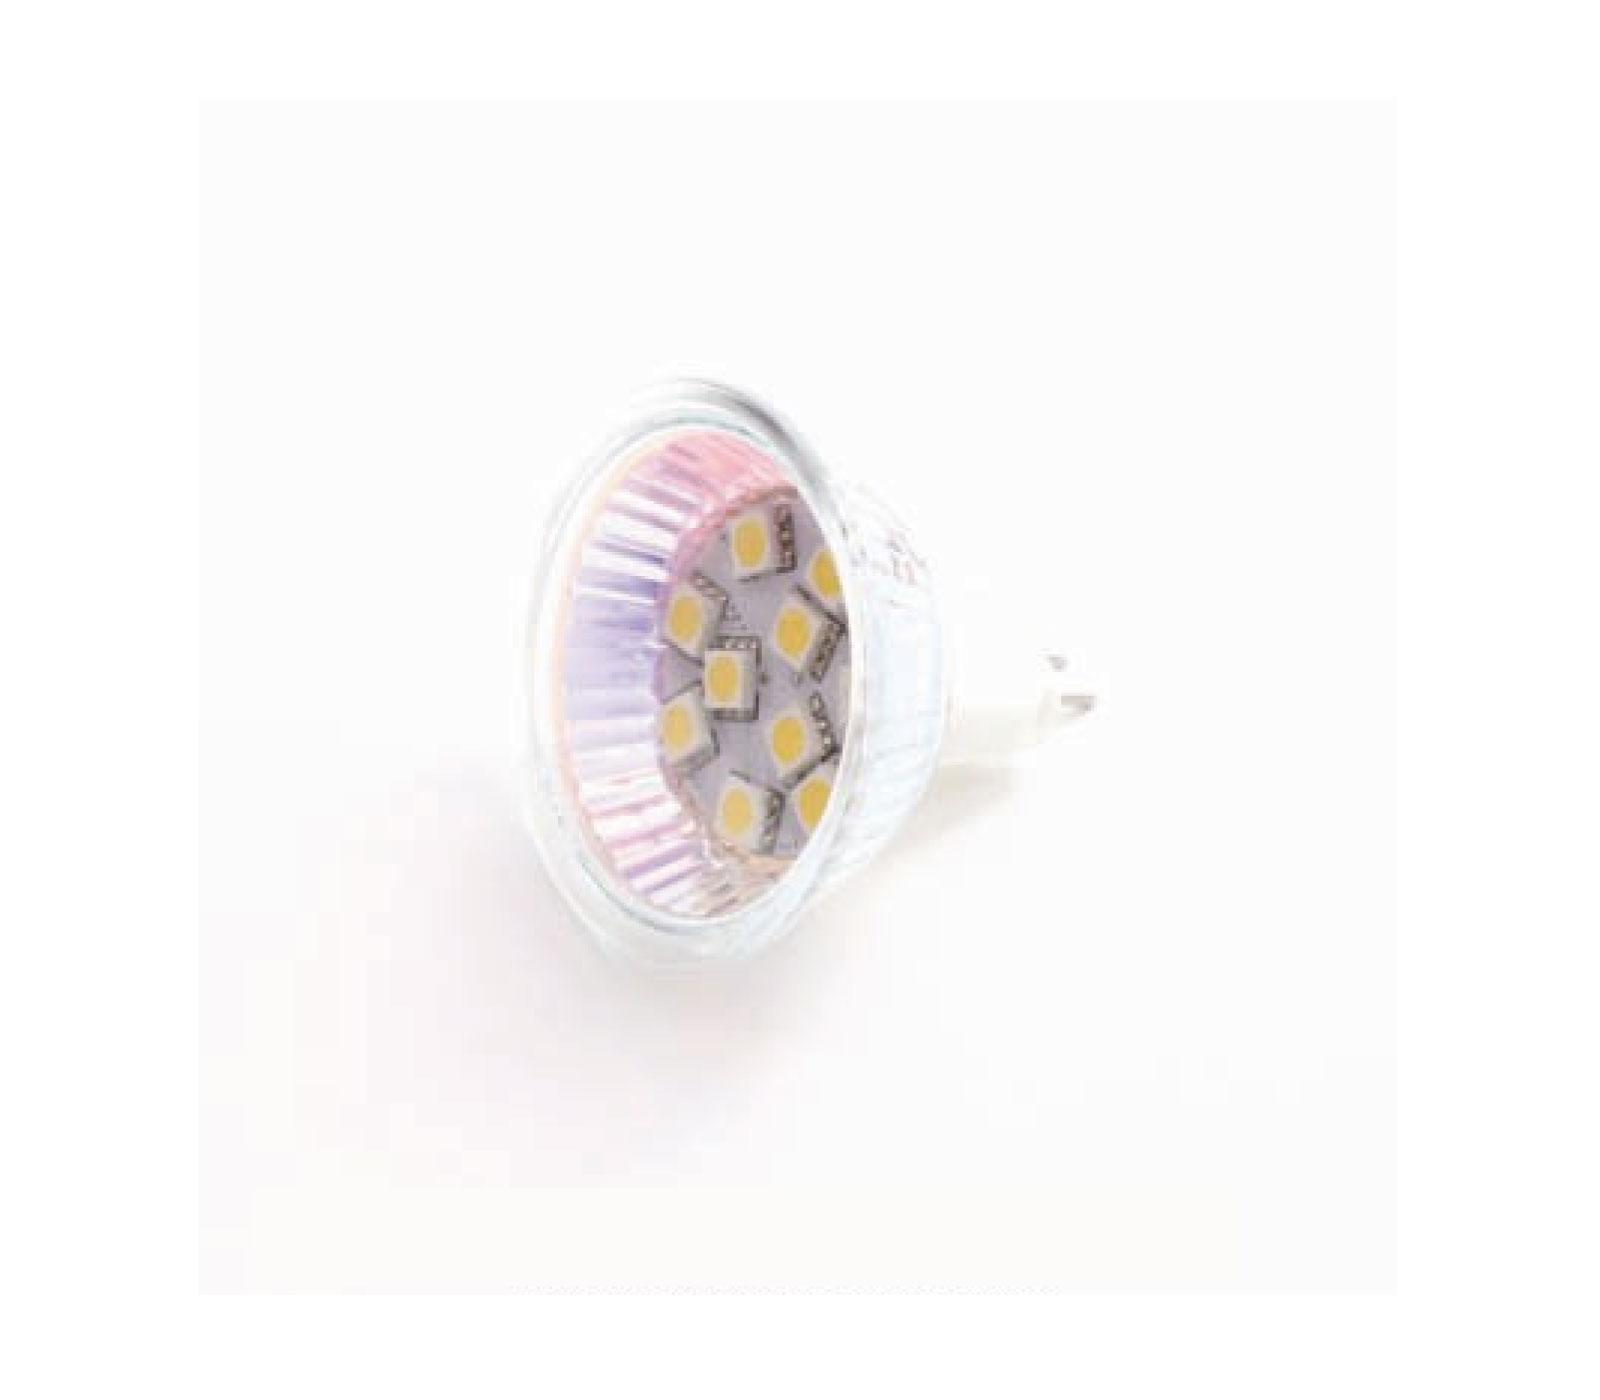 Frilight Led Vervangingslampjes Mr16